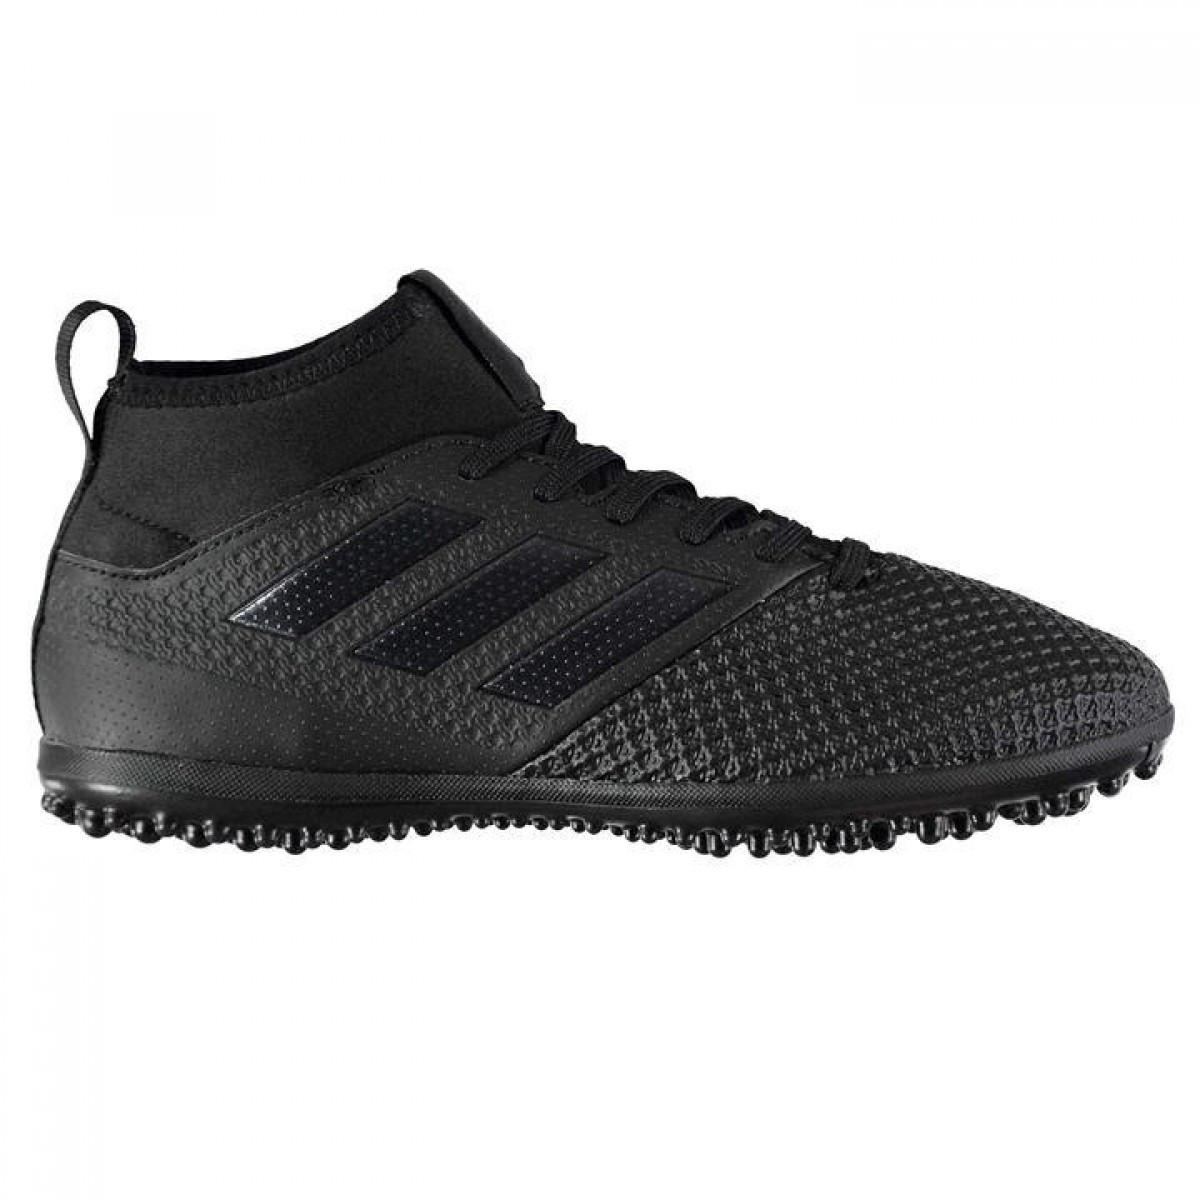 4b4bcb26 Бутсы Adidas Ace 17.3 Primemesh Astro Turf Black/Black - Оригинал ...